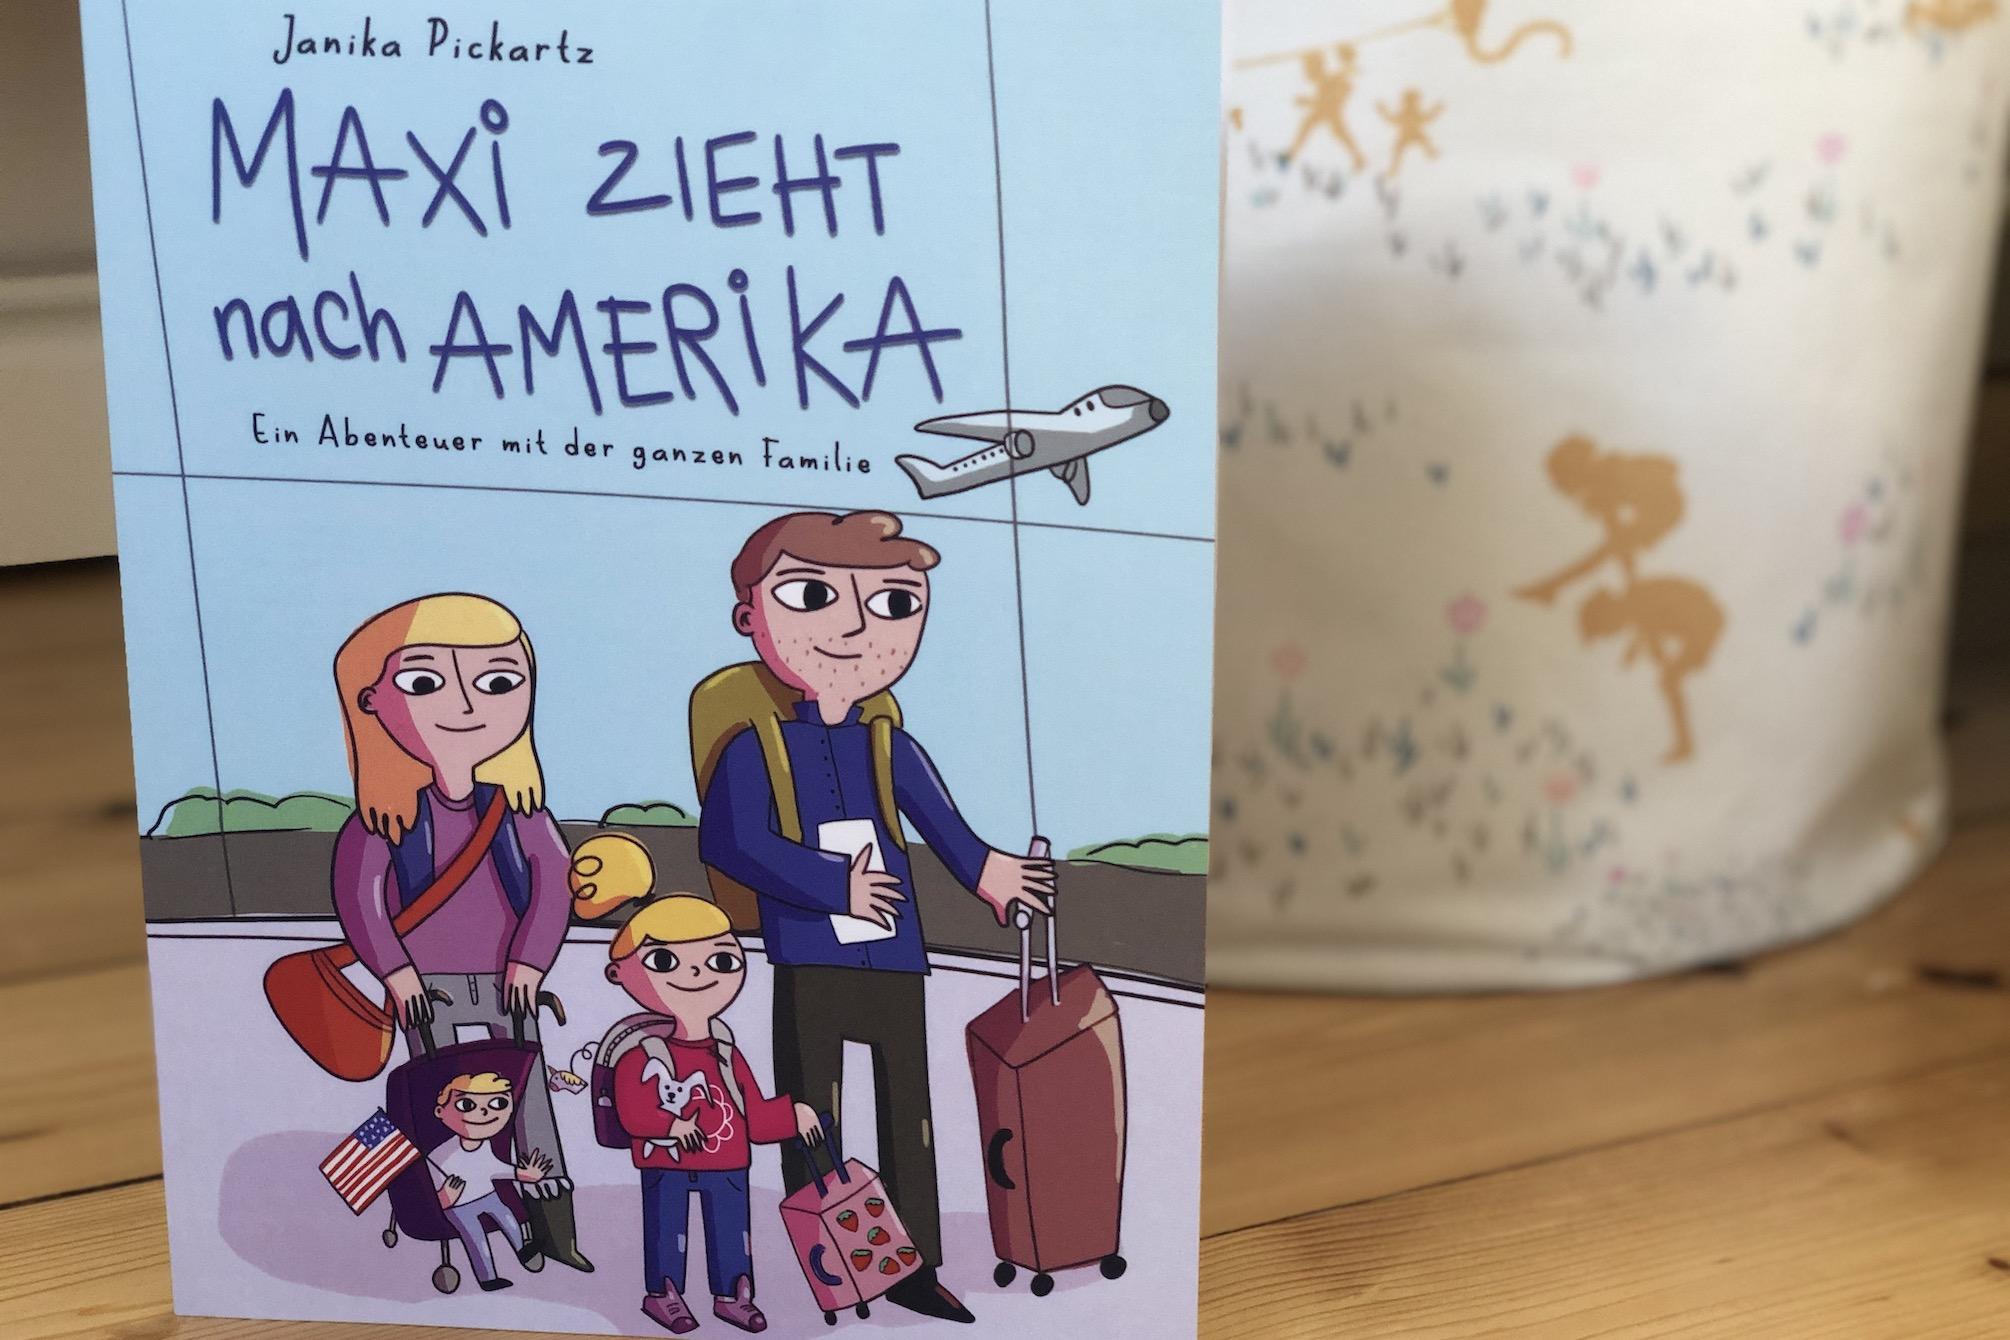 Maxi zieht nach Amerika - www.expatmamas.de/blog/ #expatmamas #buchtipps